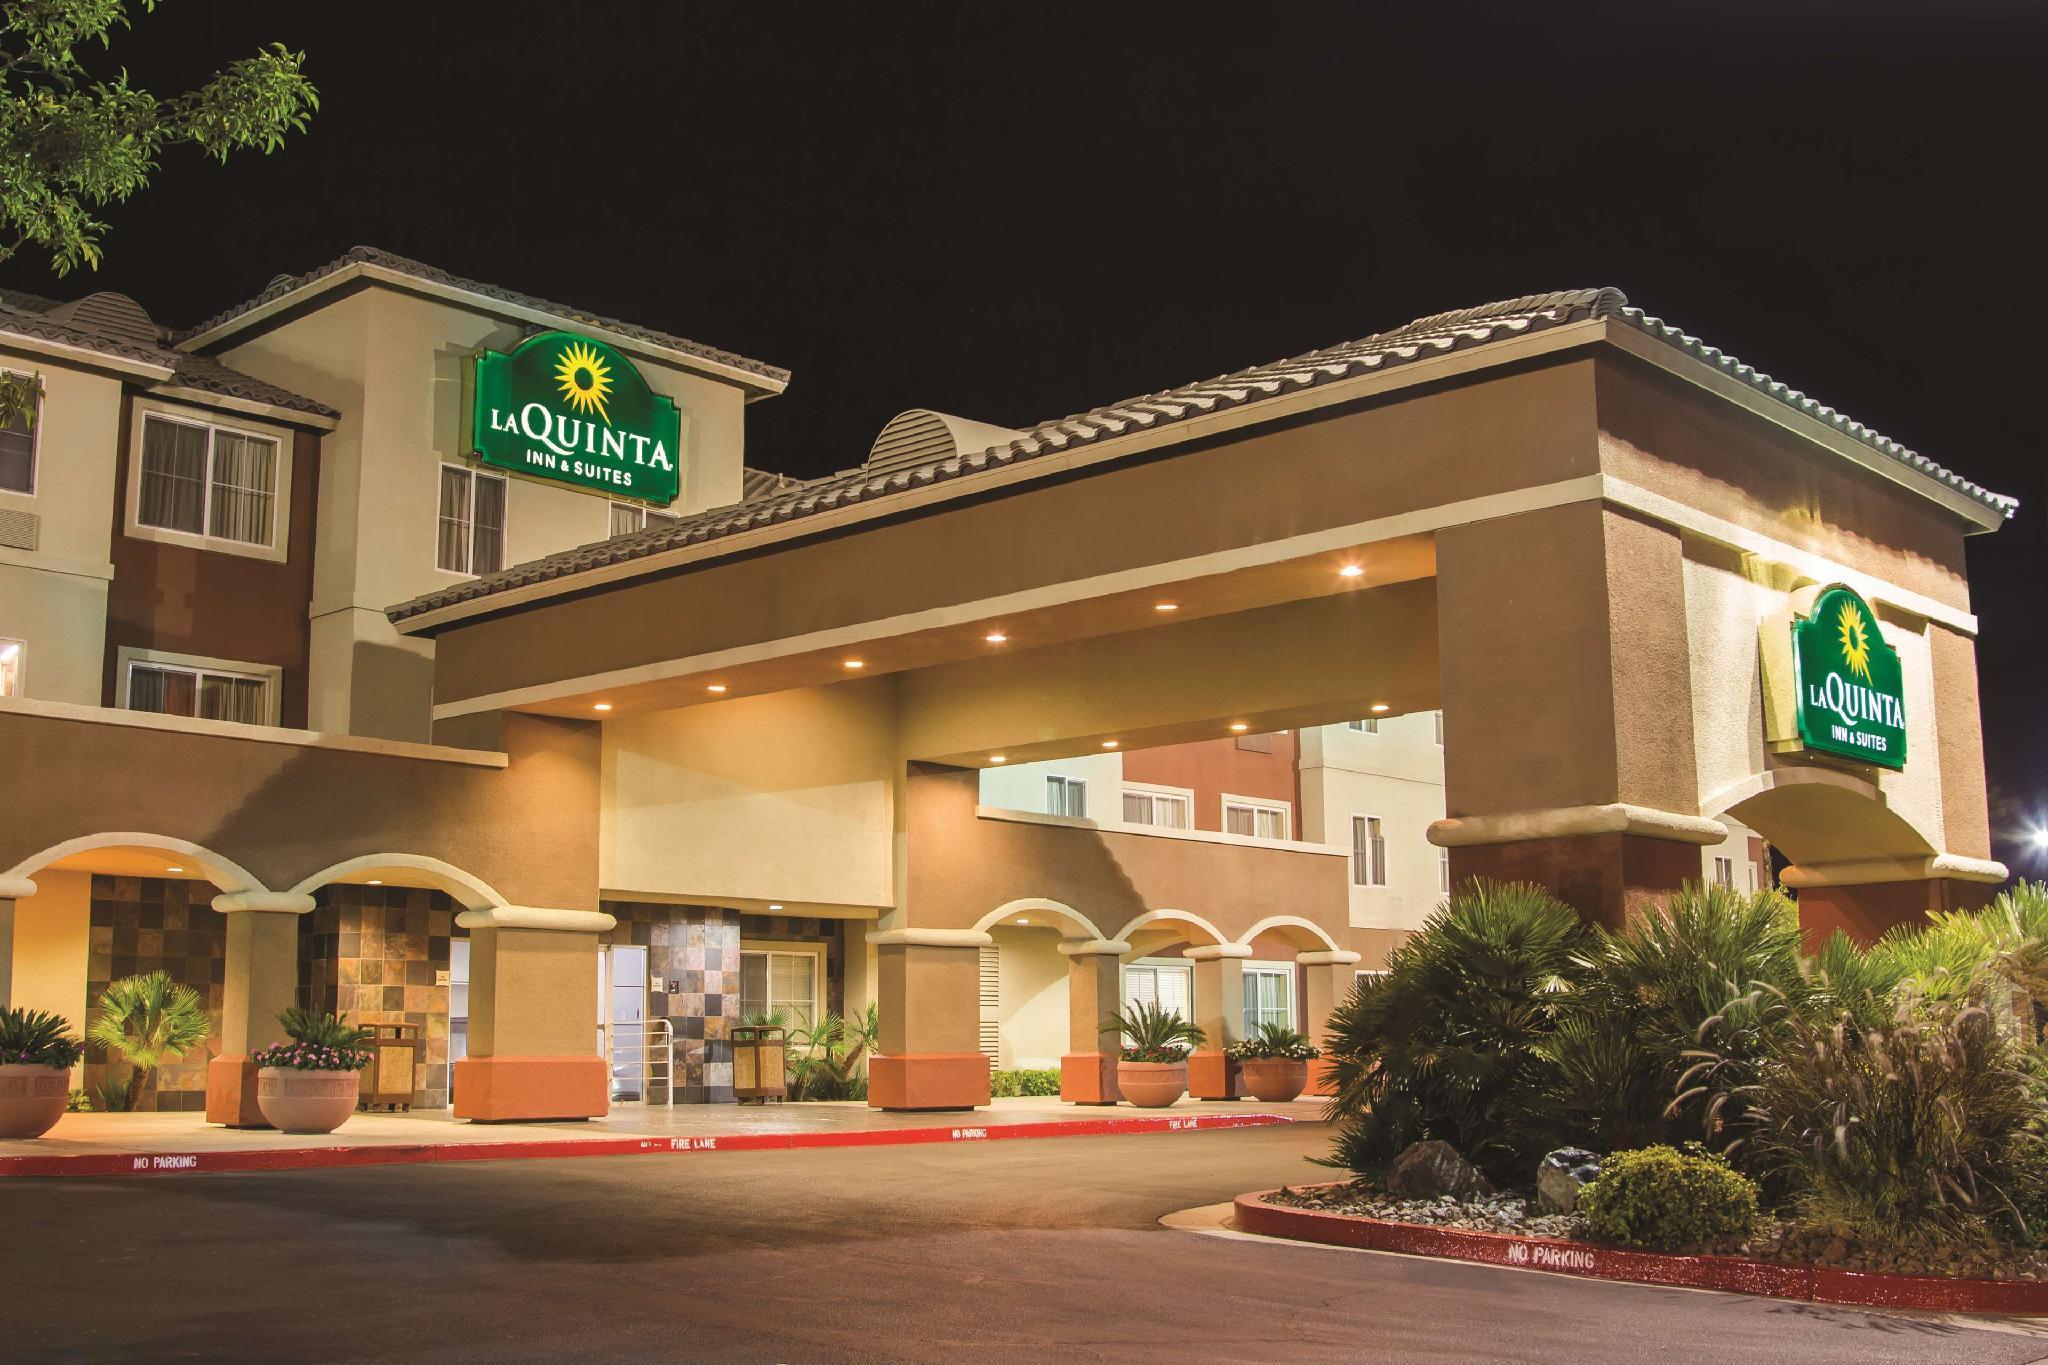 La Quinta Inn And Suites By Wyndham Las Vegas Red Rock